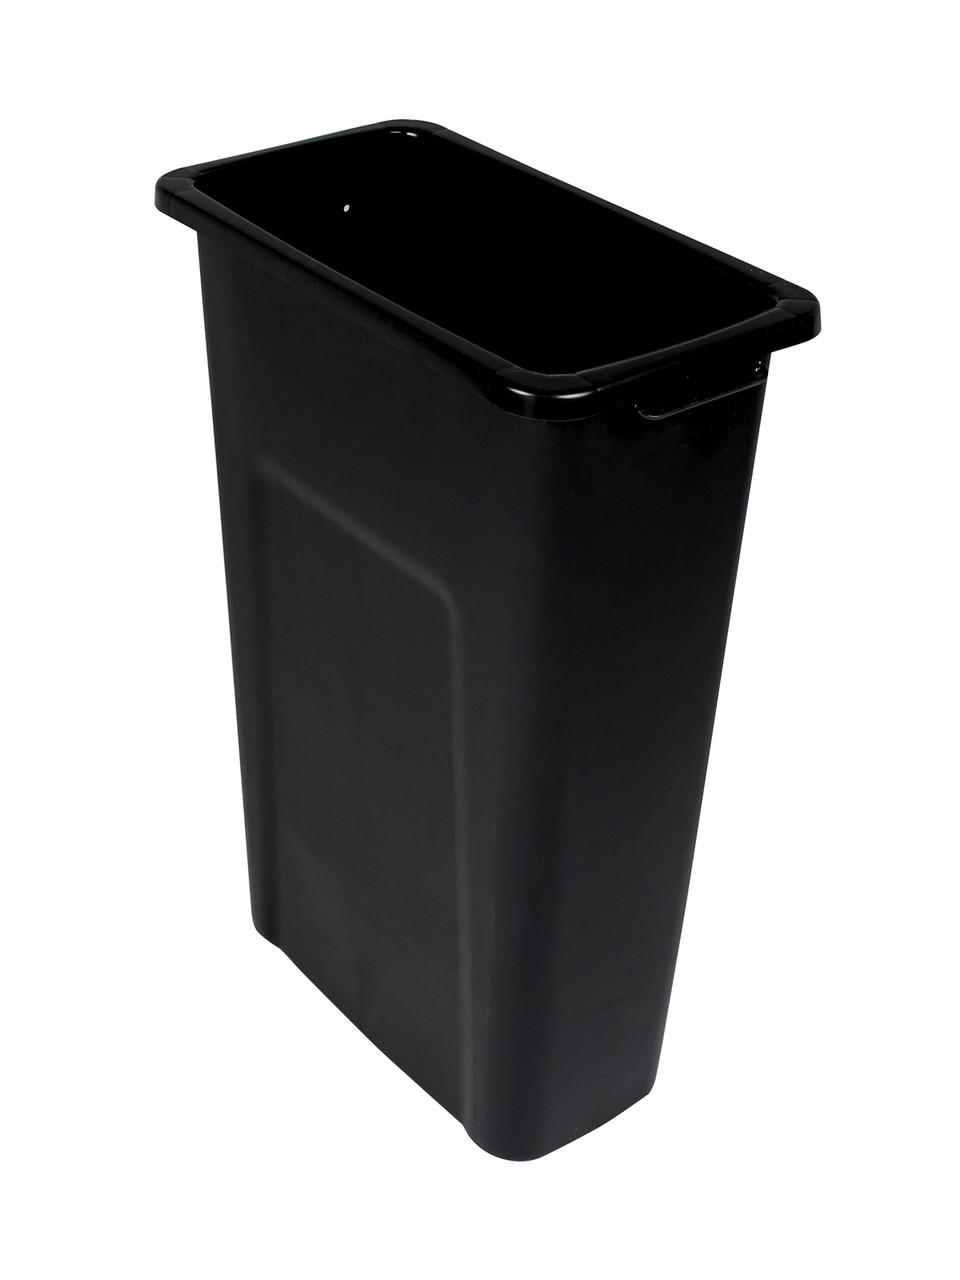 16 Gallon Skinny Plastic Home & Office Trash Can Black